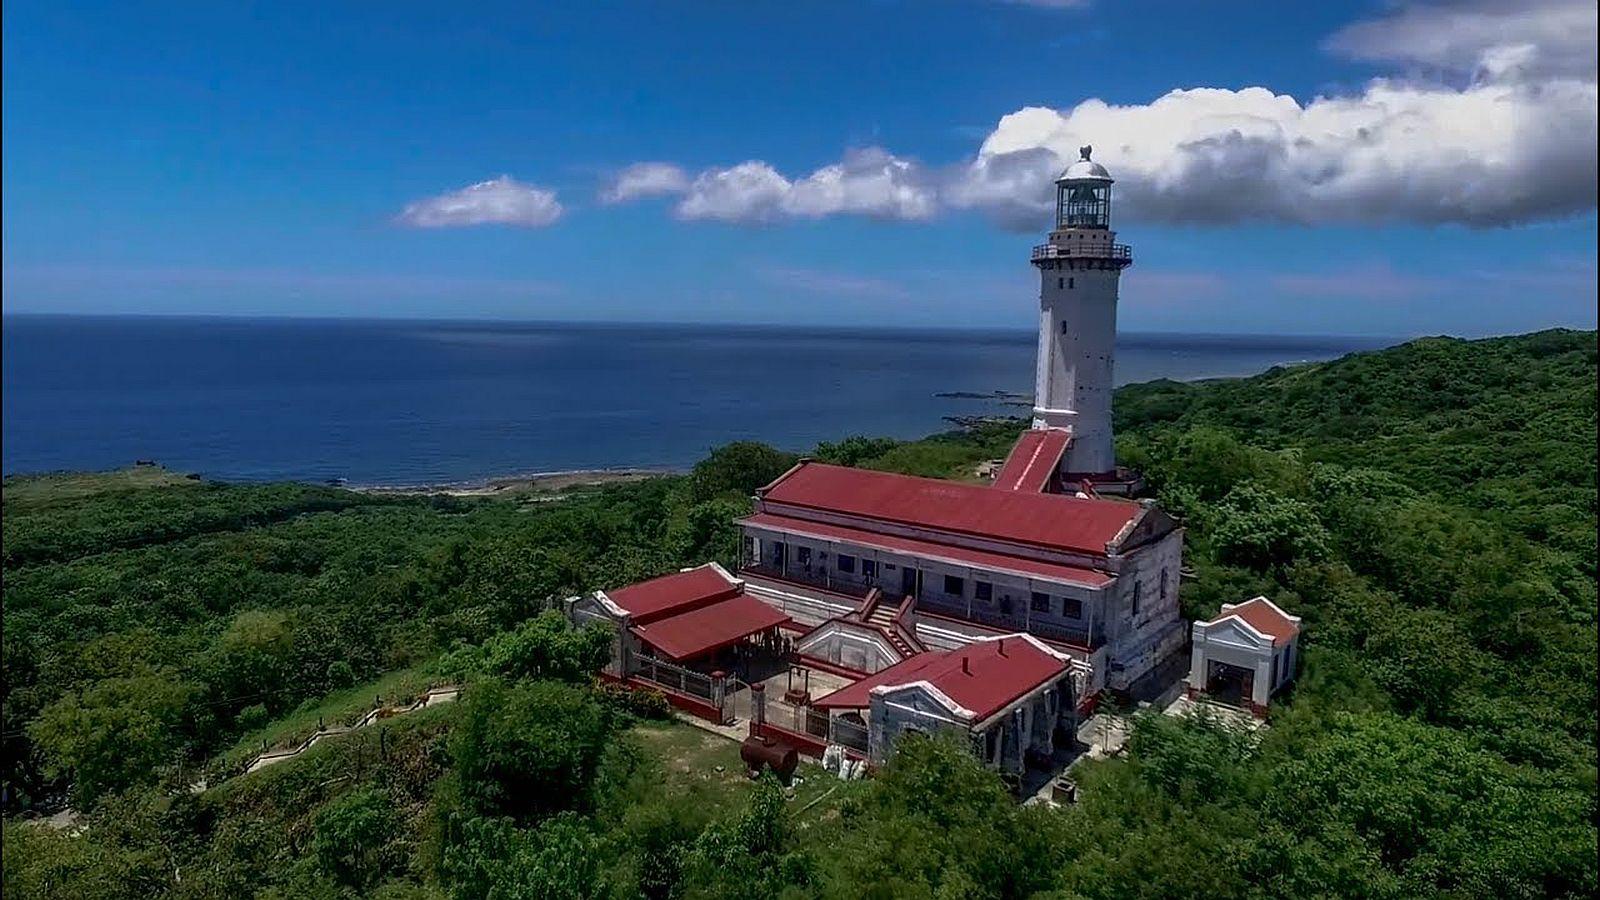 PHILIPPINEN REISEN - LEUCHTTÜRME - Cape Bojedor Leuchturm in Burgos, Ilocos Norte